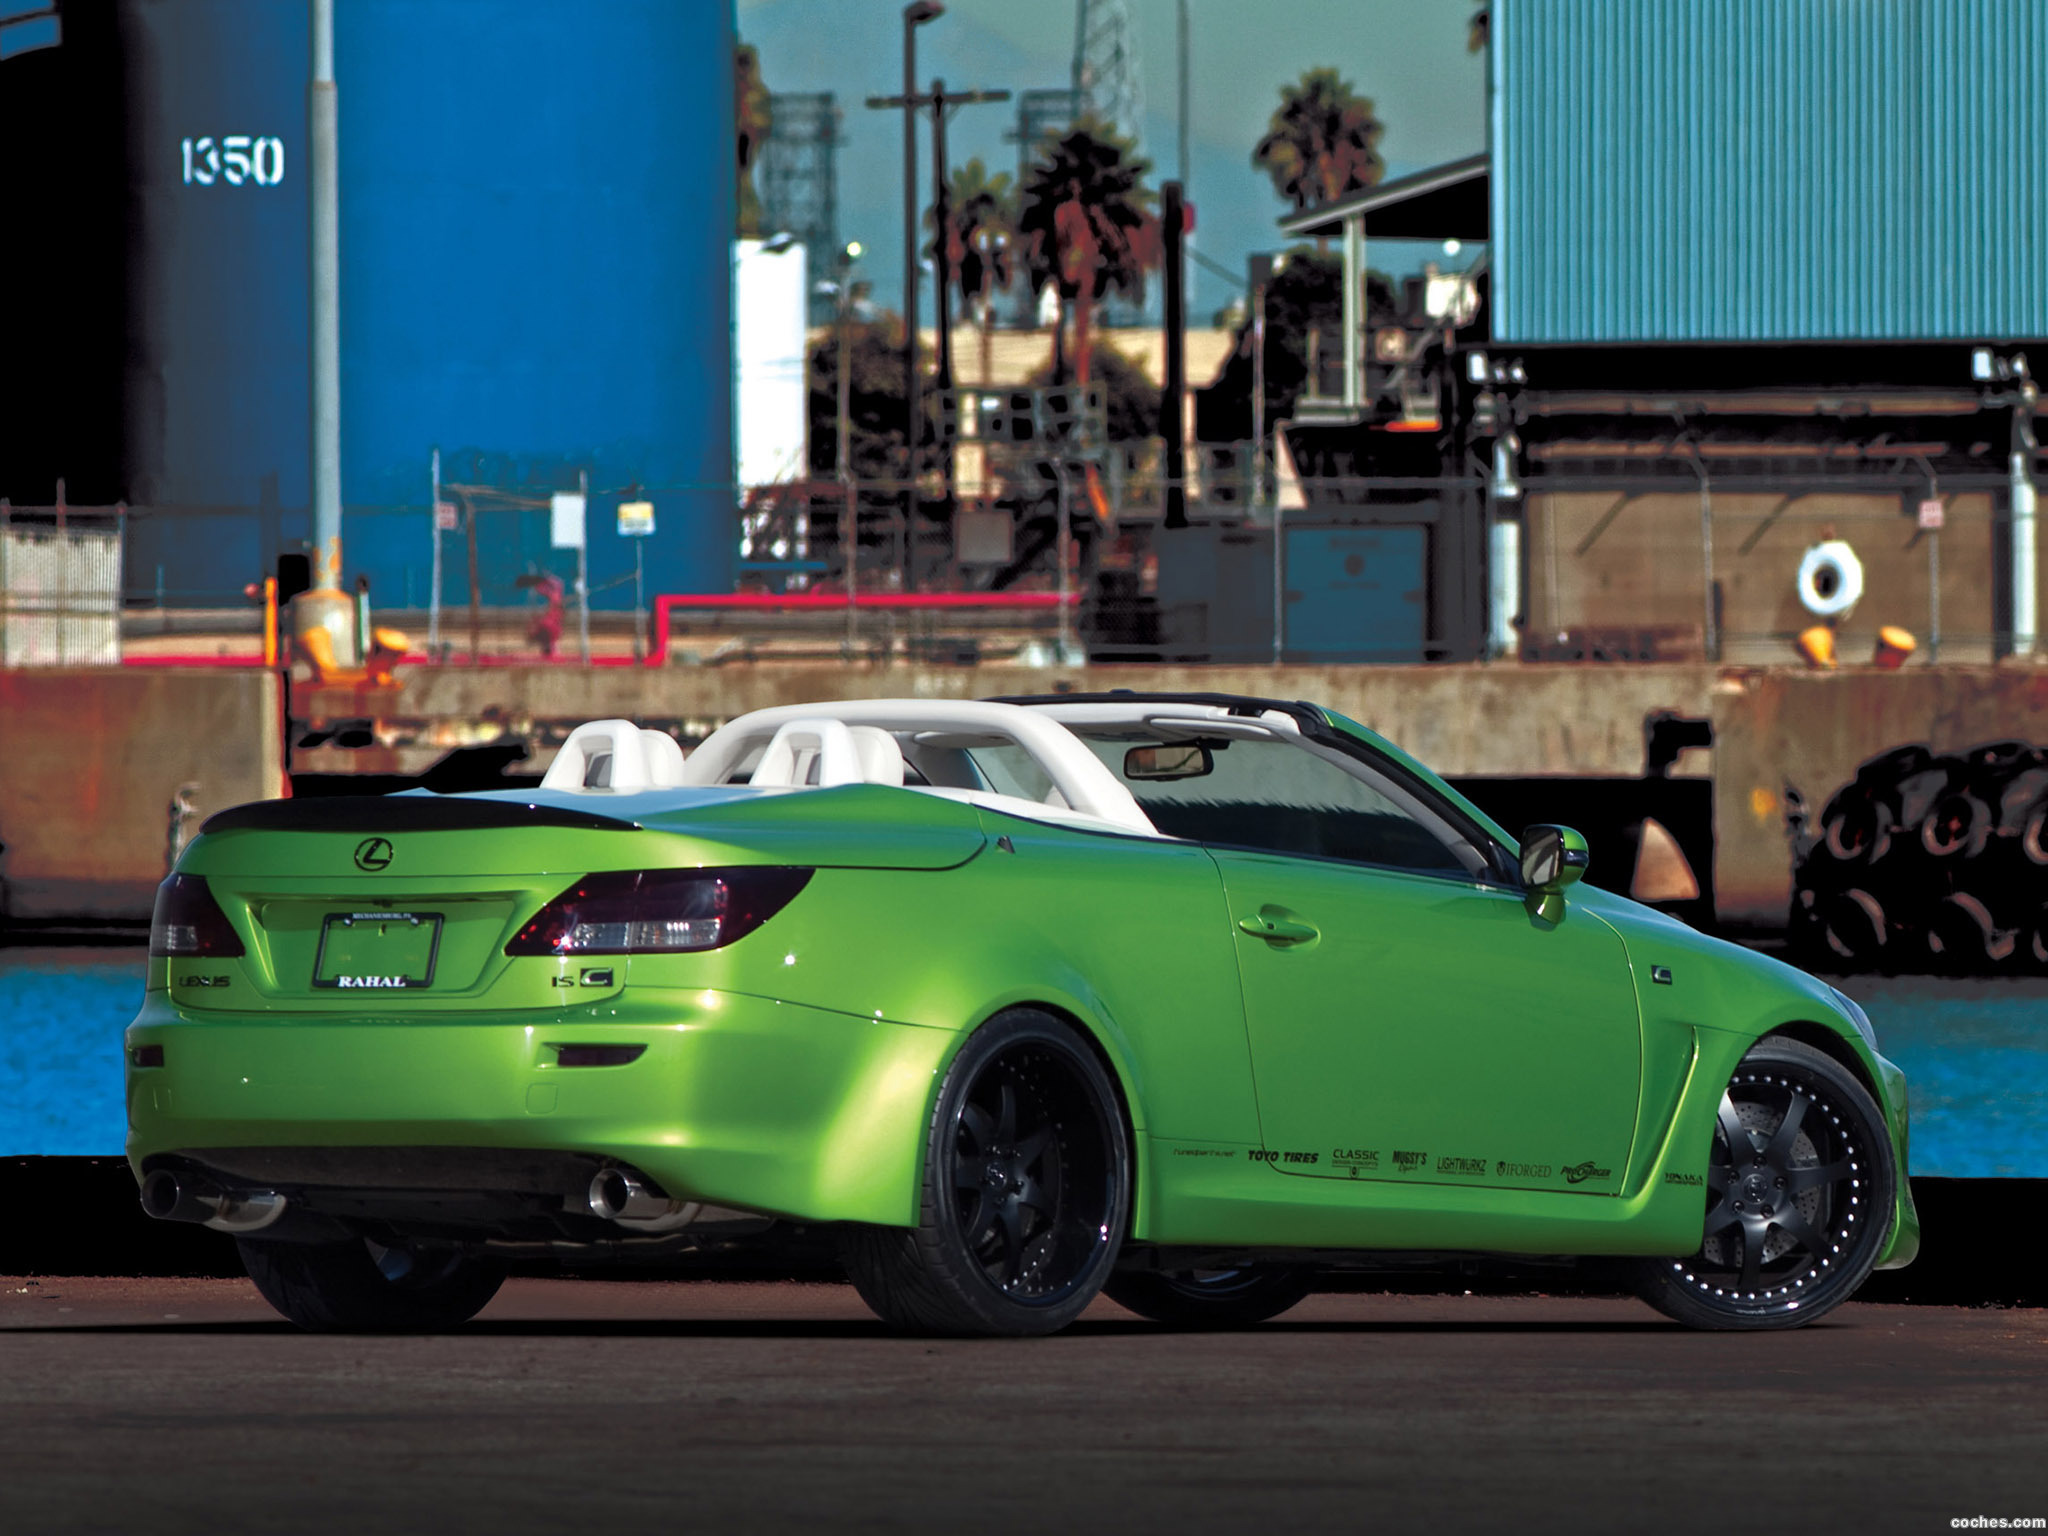 Foto 1 de Lexus IS 350C Supercharged V6 by Fox Marketing 2009